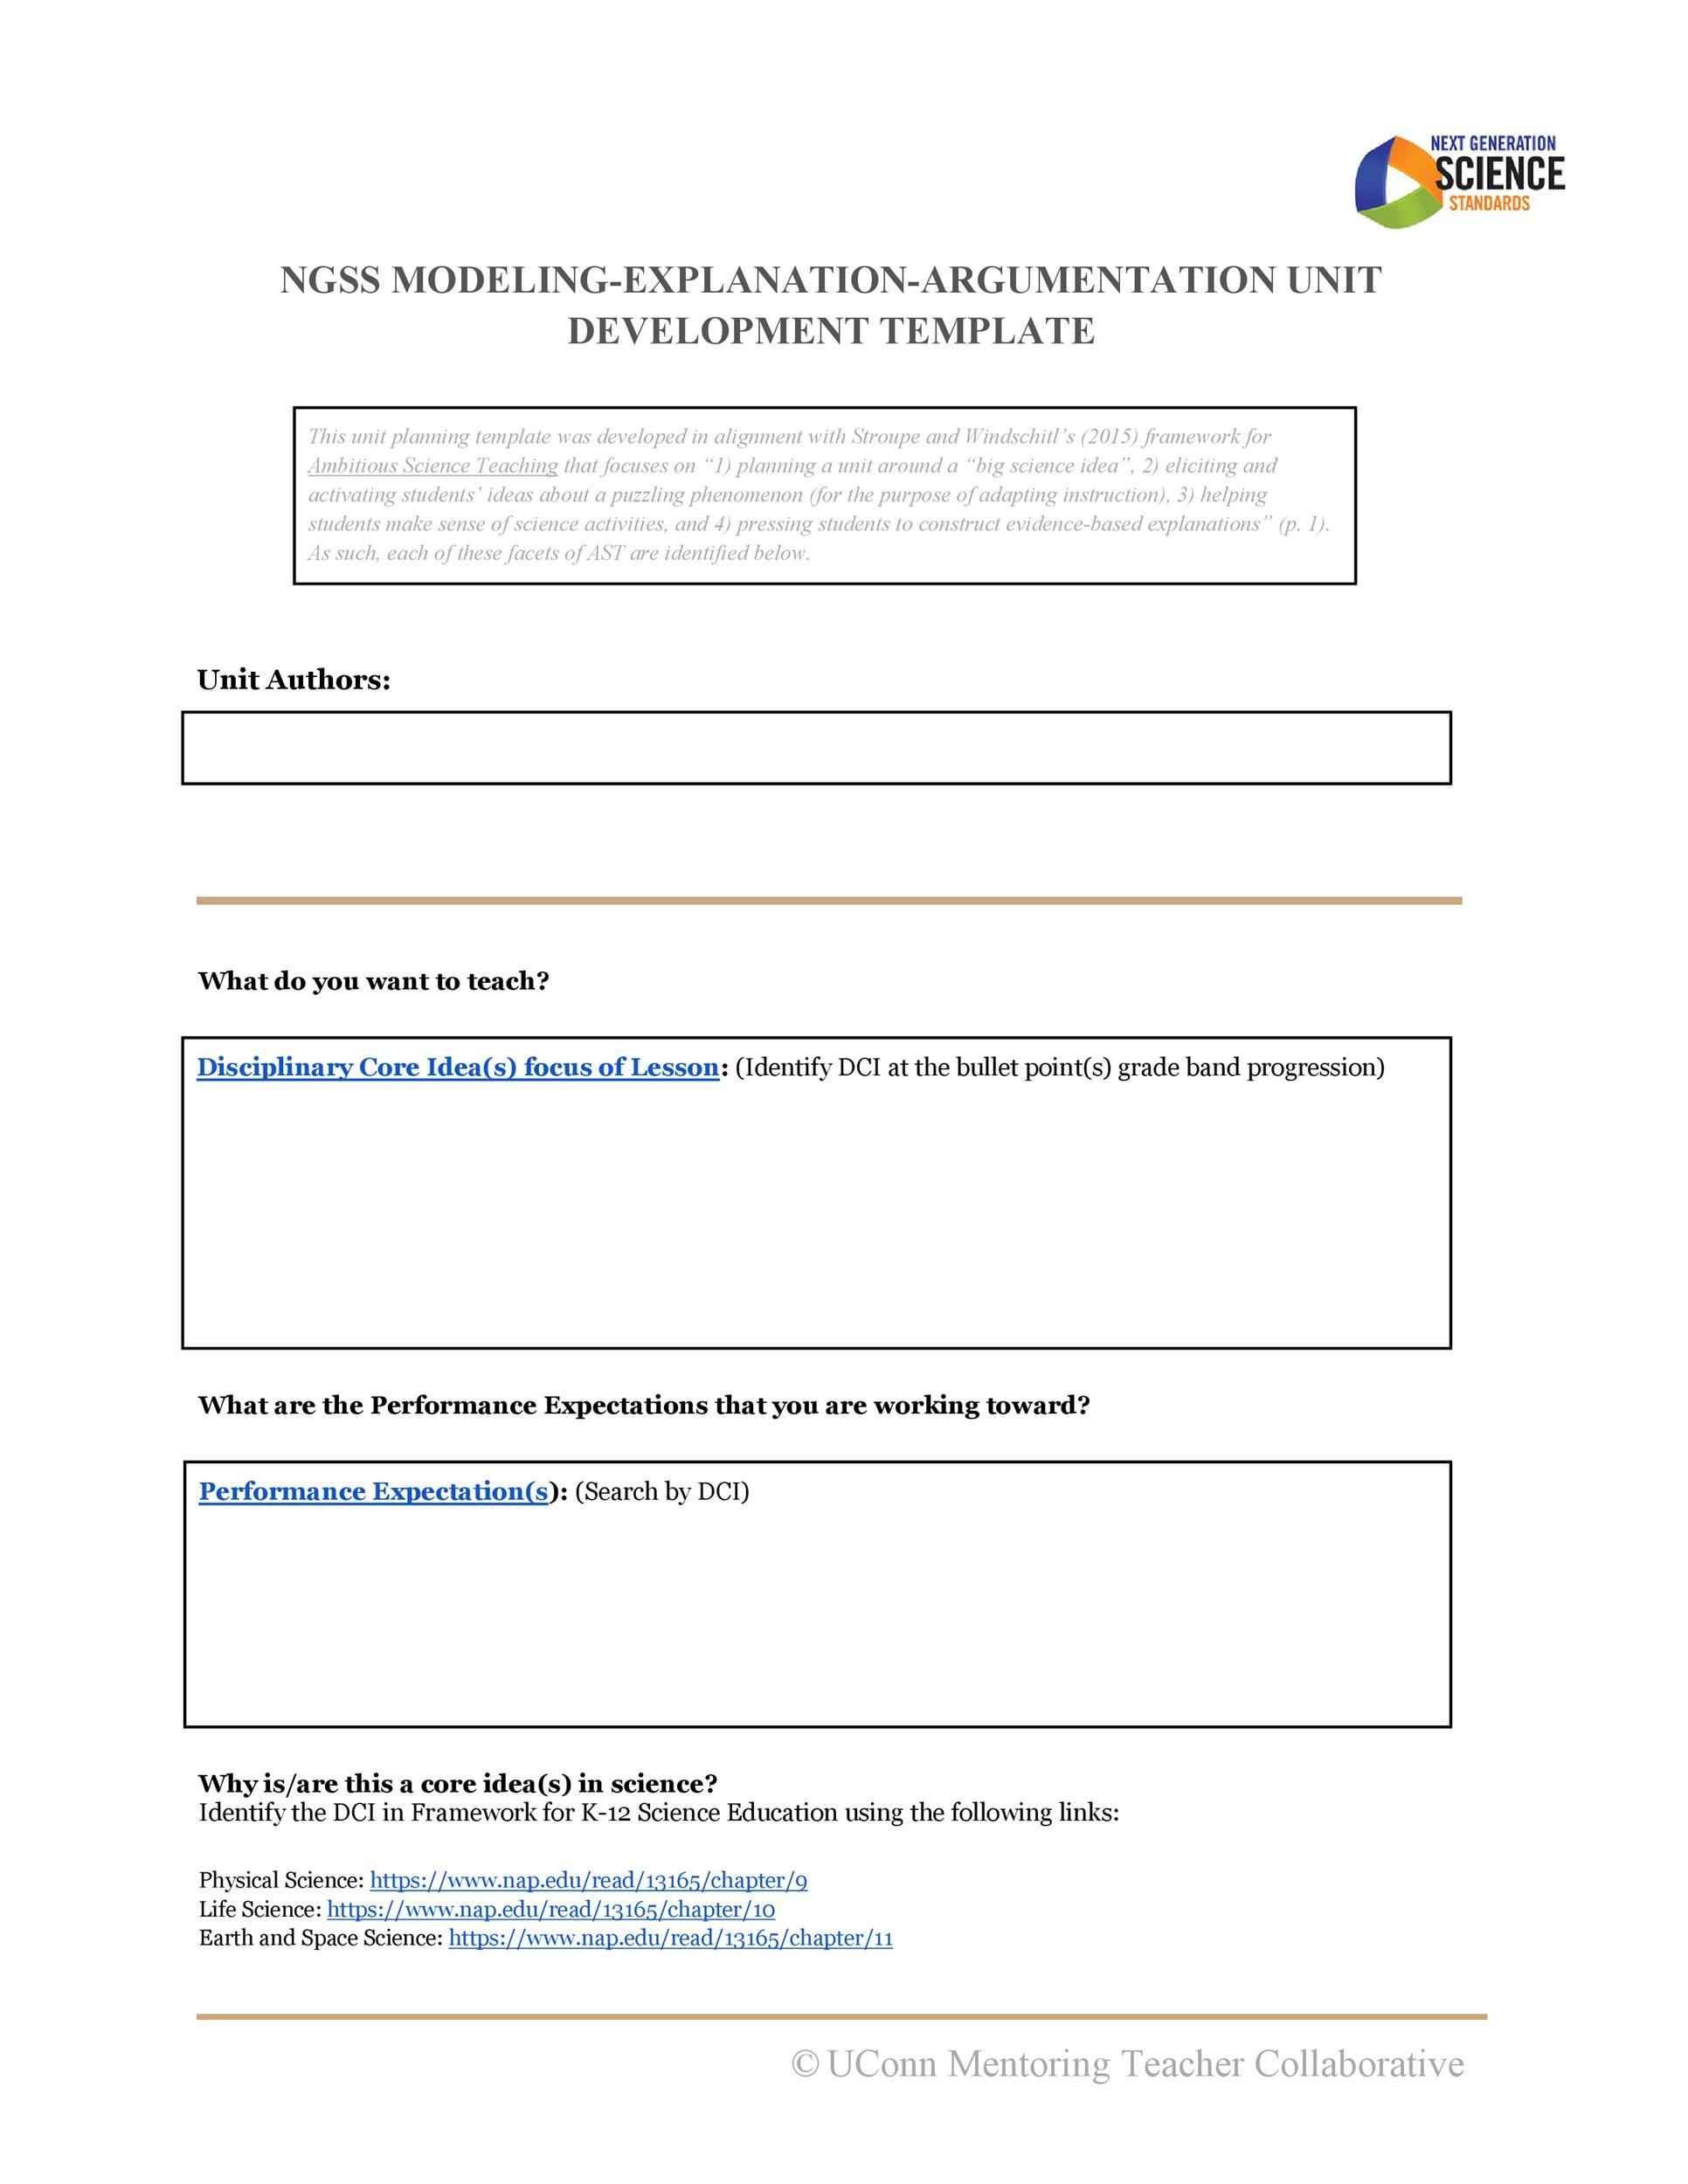 Free unit plan template 20